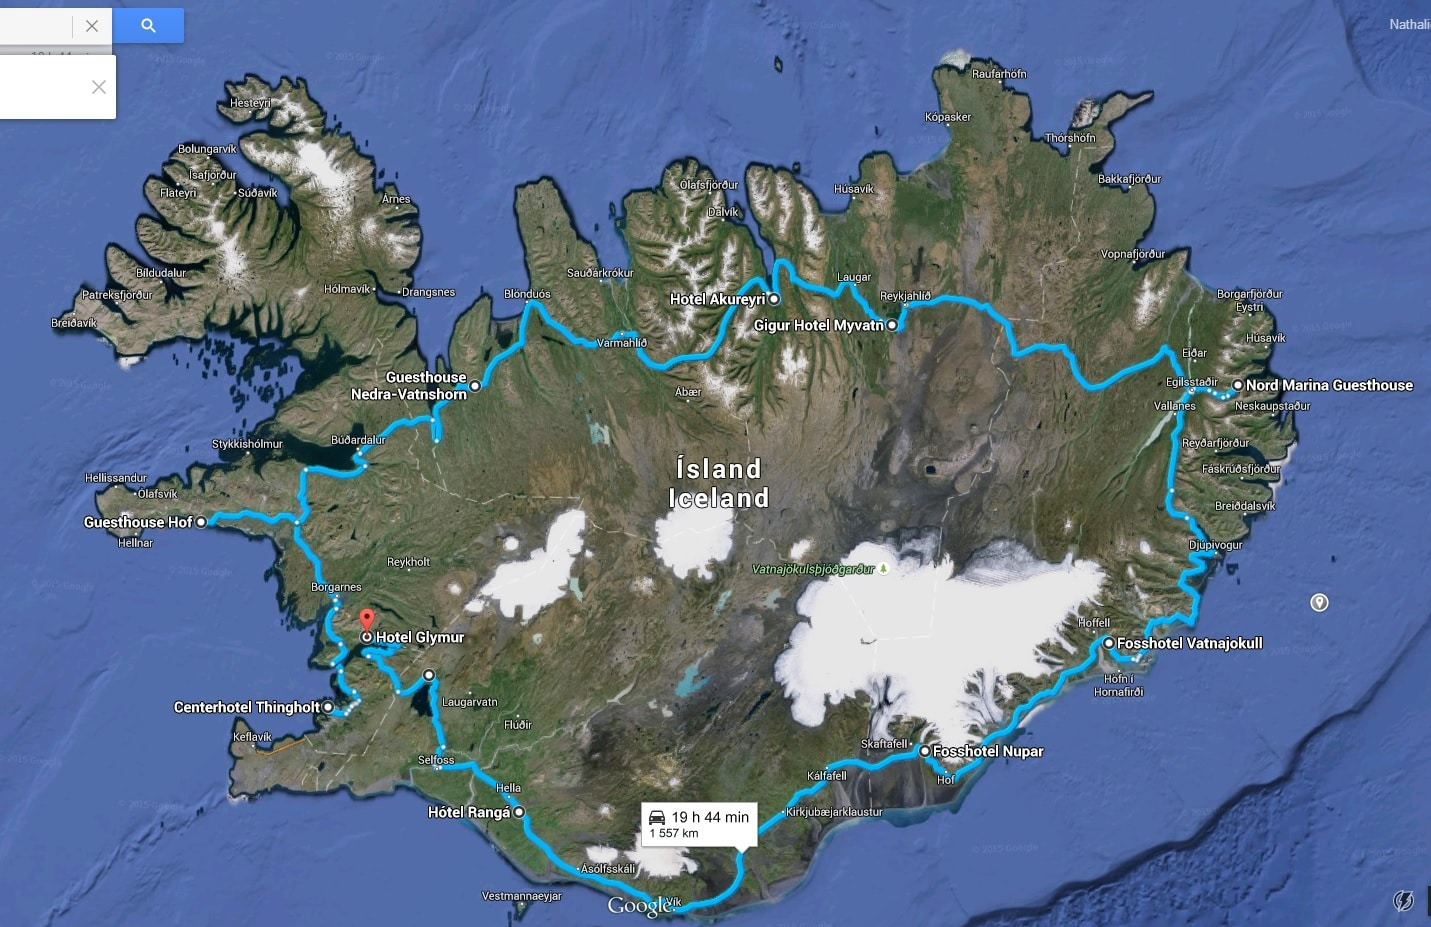 voyage de noces l 39 islande en 15 jours. Black Bedroom Furniture Sets. Home Design Ideas